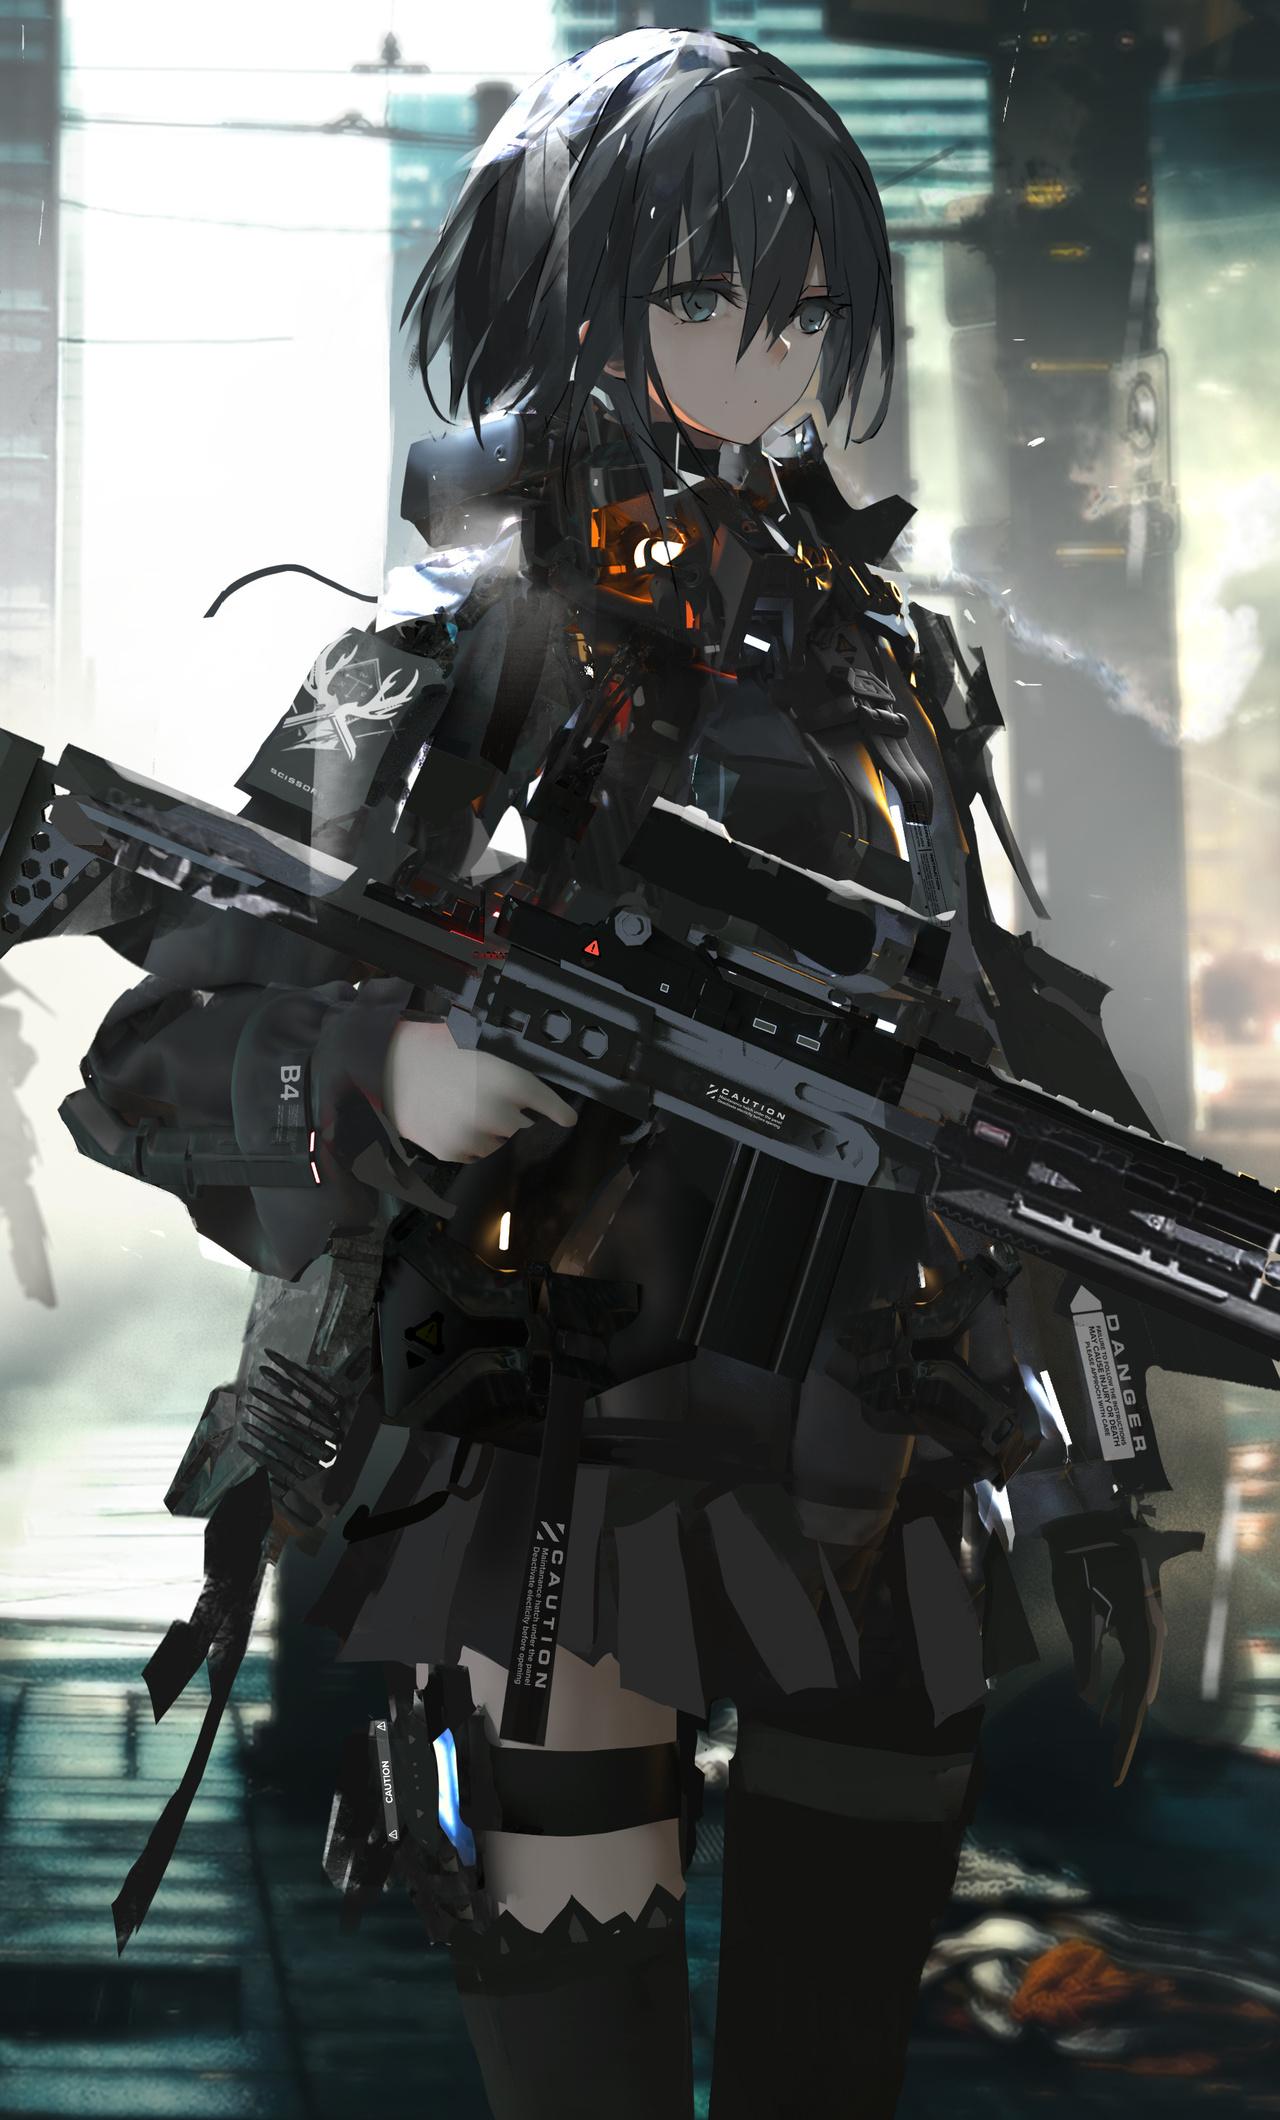 Anime Girl Wallpaper Gun - Anime Wallpaper HD